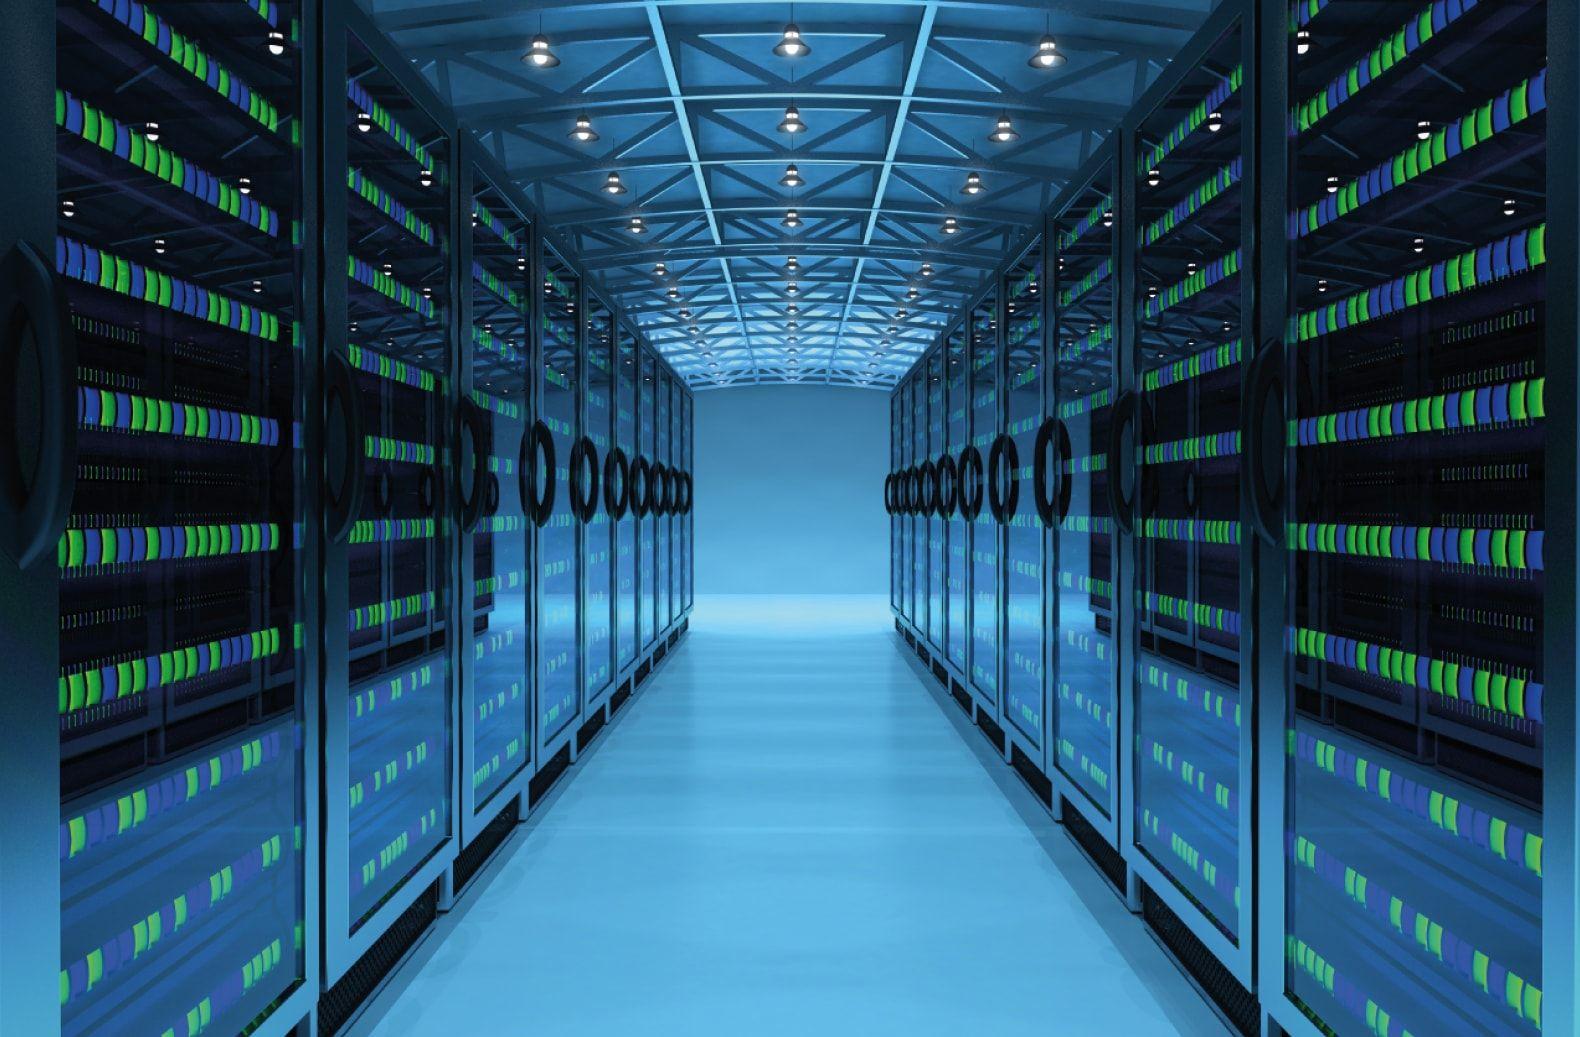 Skylark Software Defined Data Center Networking